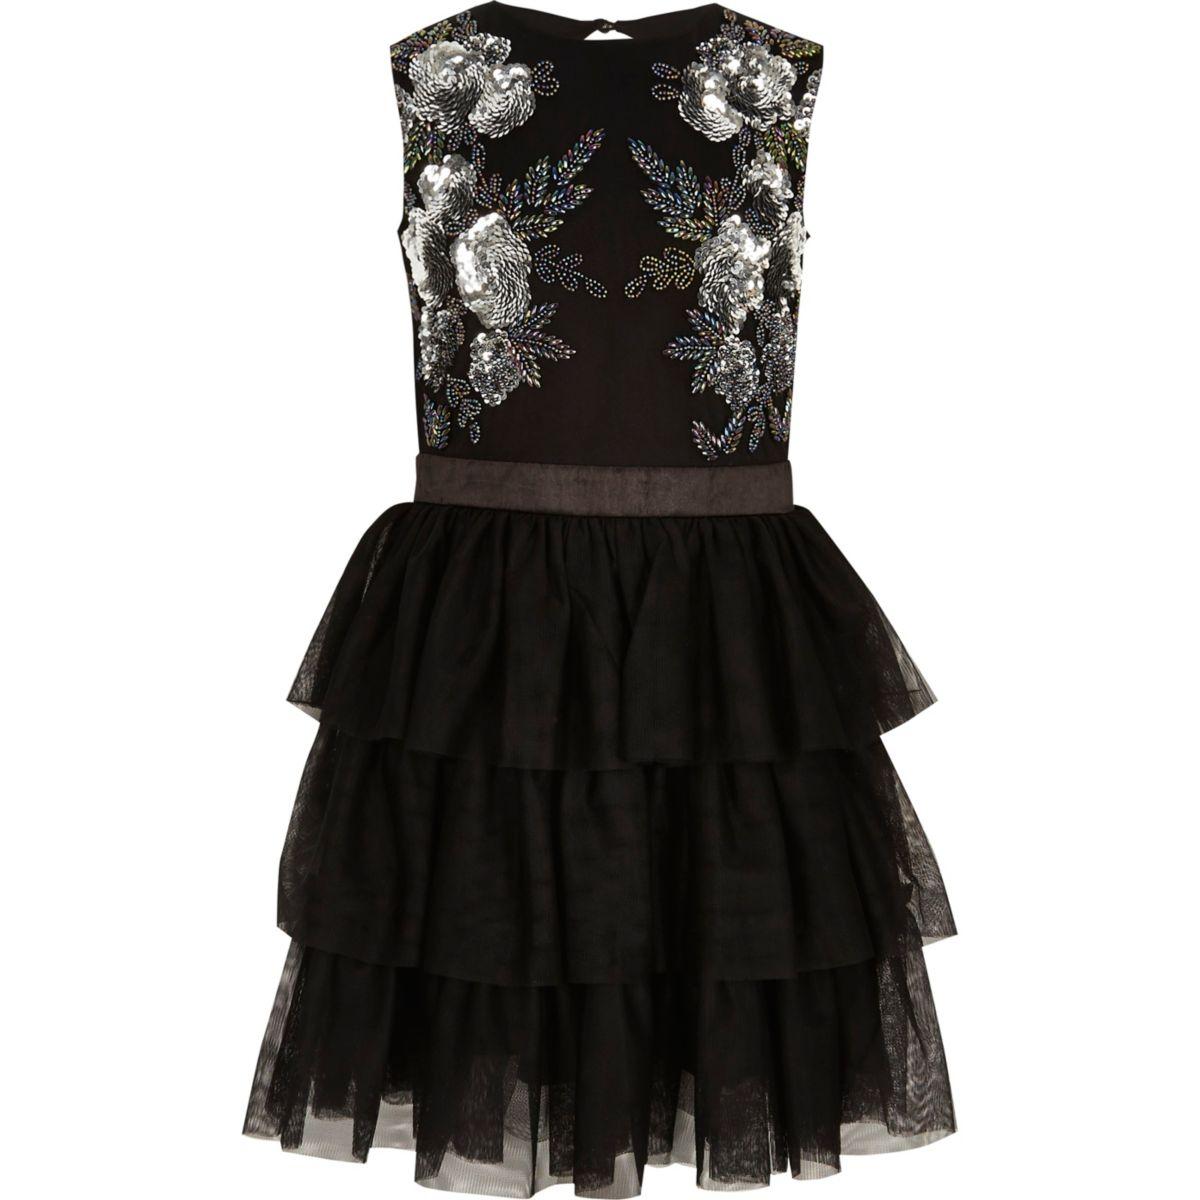 Girls black mesh bead embellished prom dress